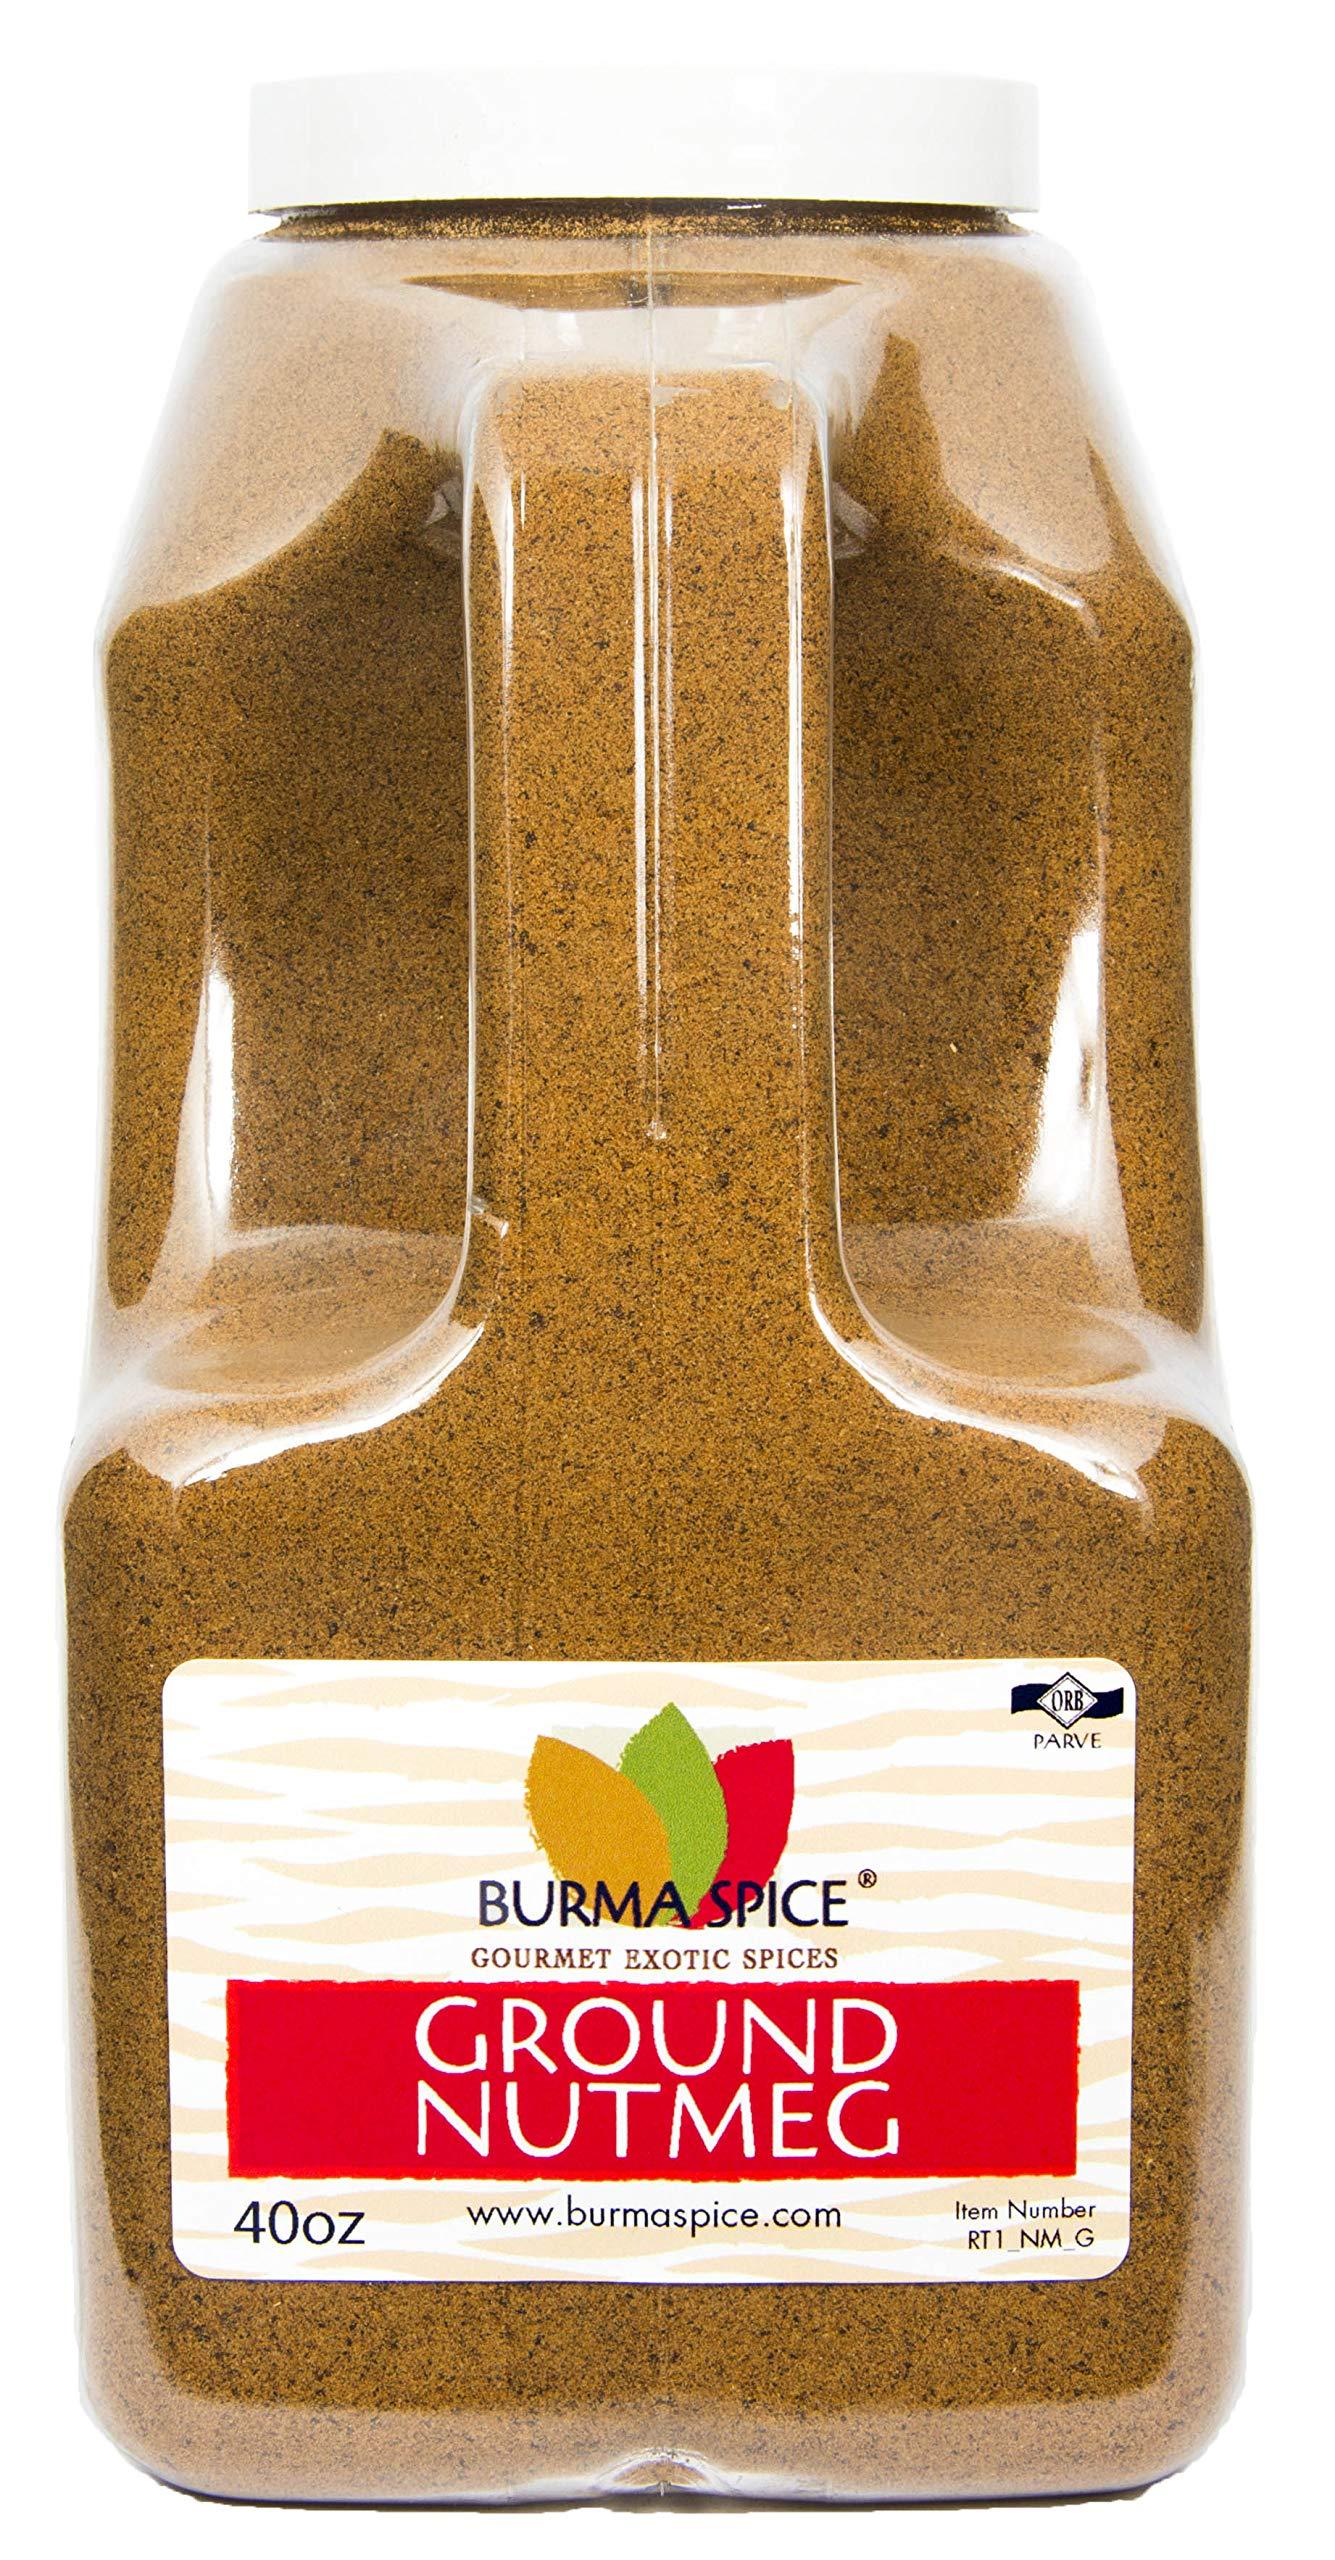 Ground Nutmeg : Pure Spice Blend Seasoning, No Additives, Holiday Spice : Kosher (40oz.)